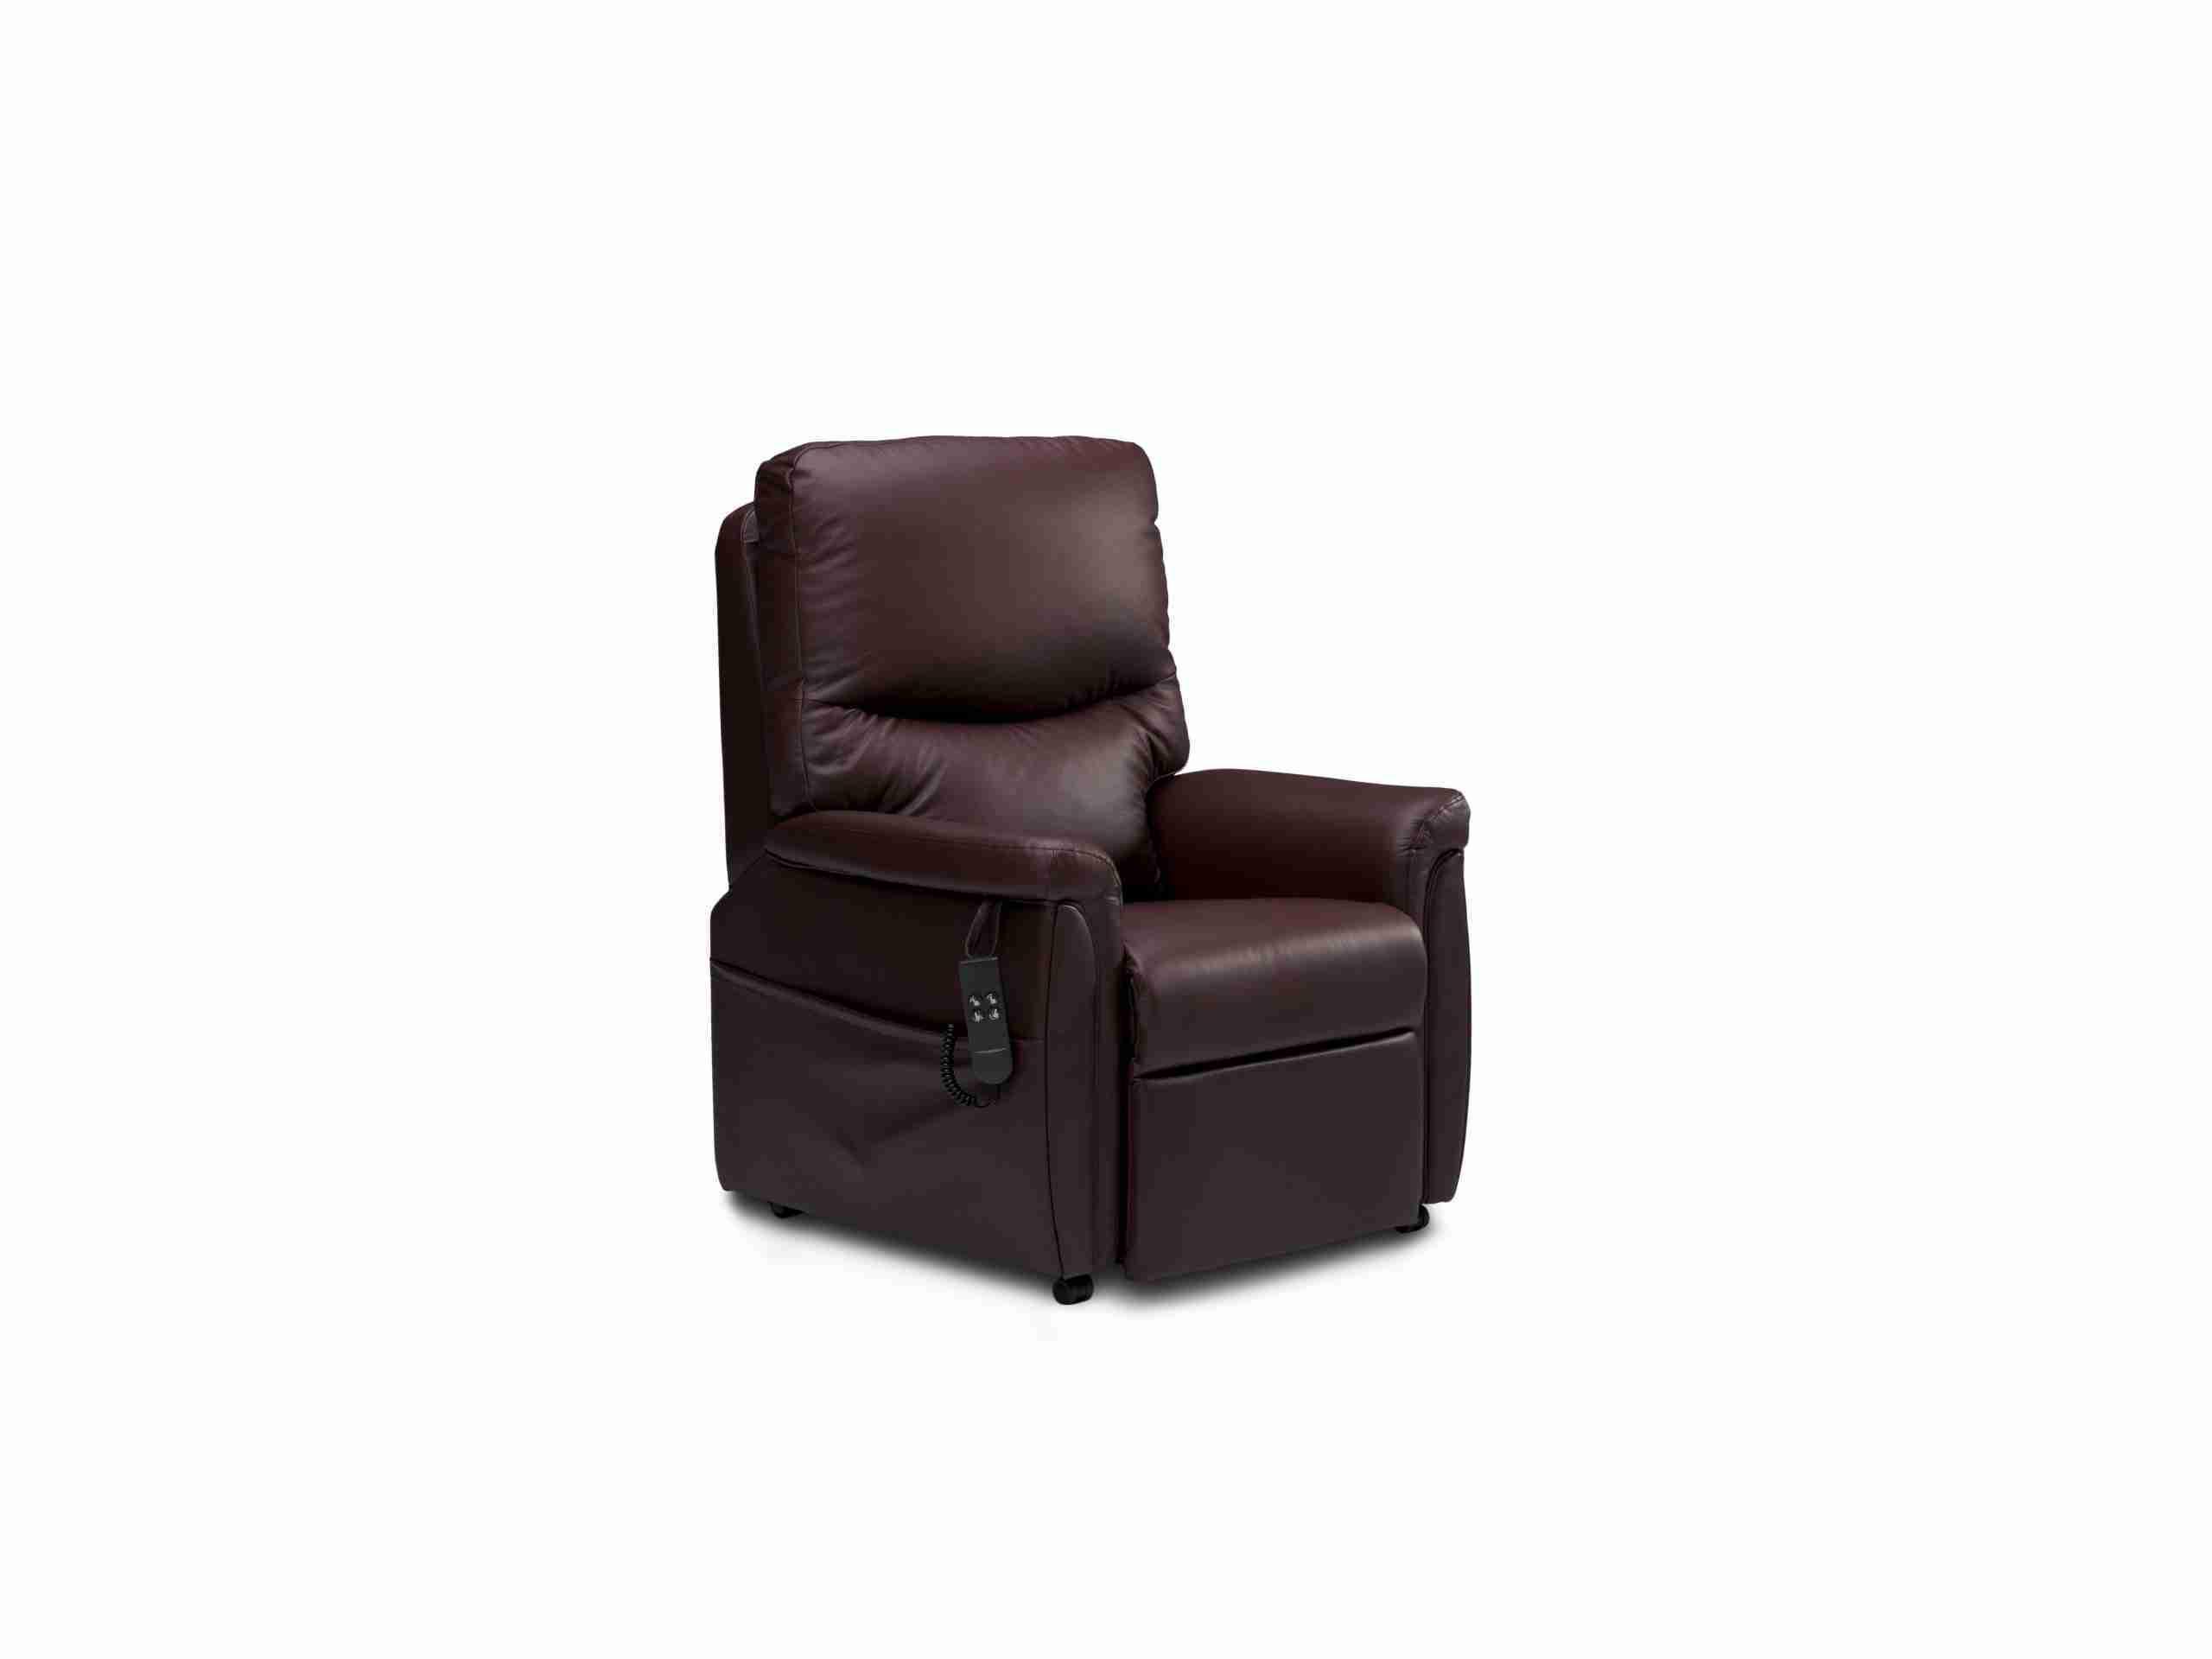 Kingston Chair Repose02